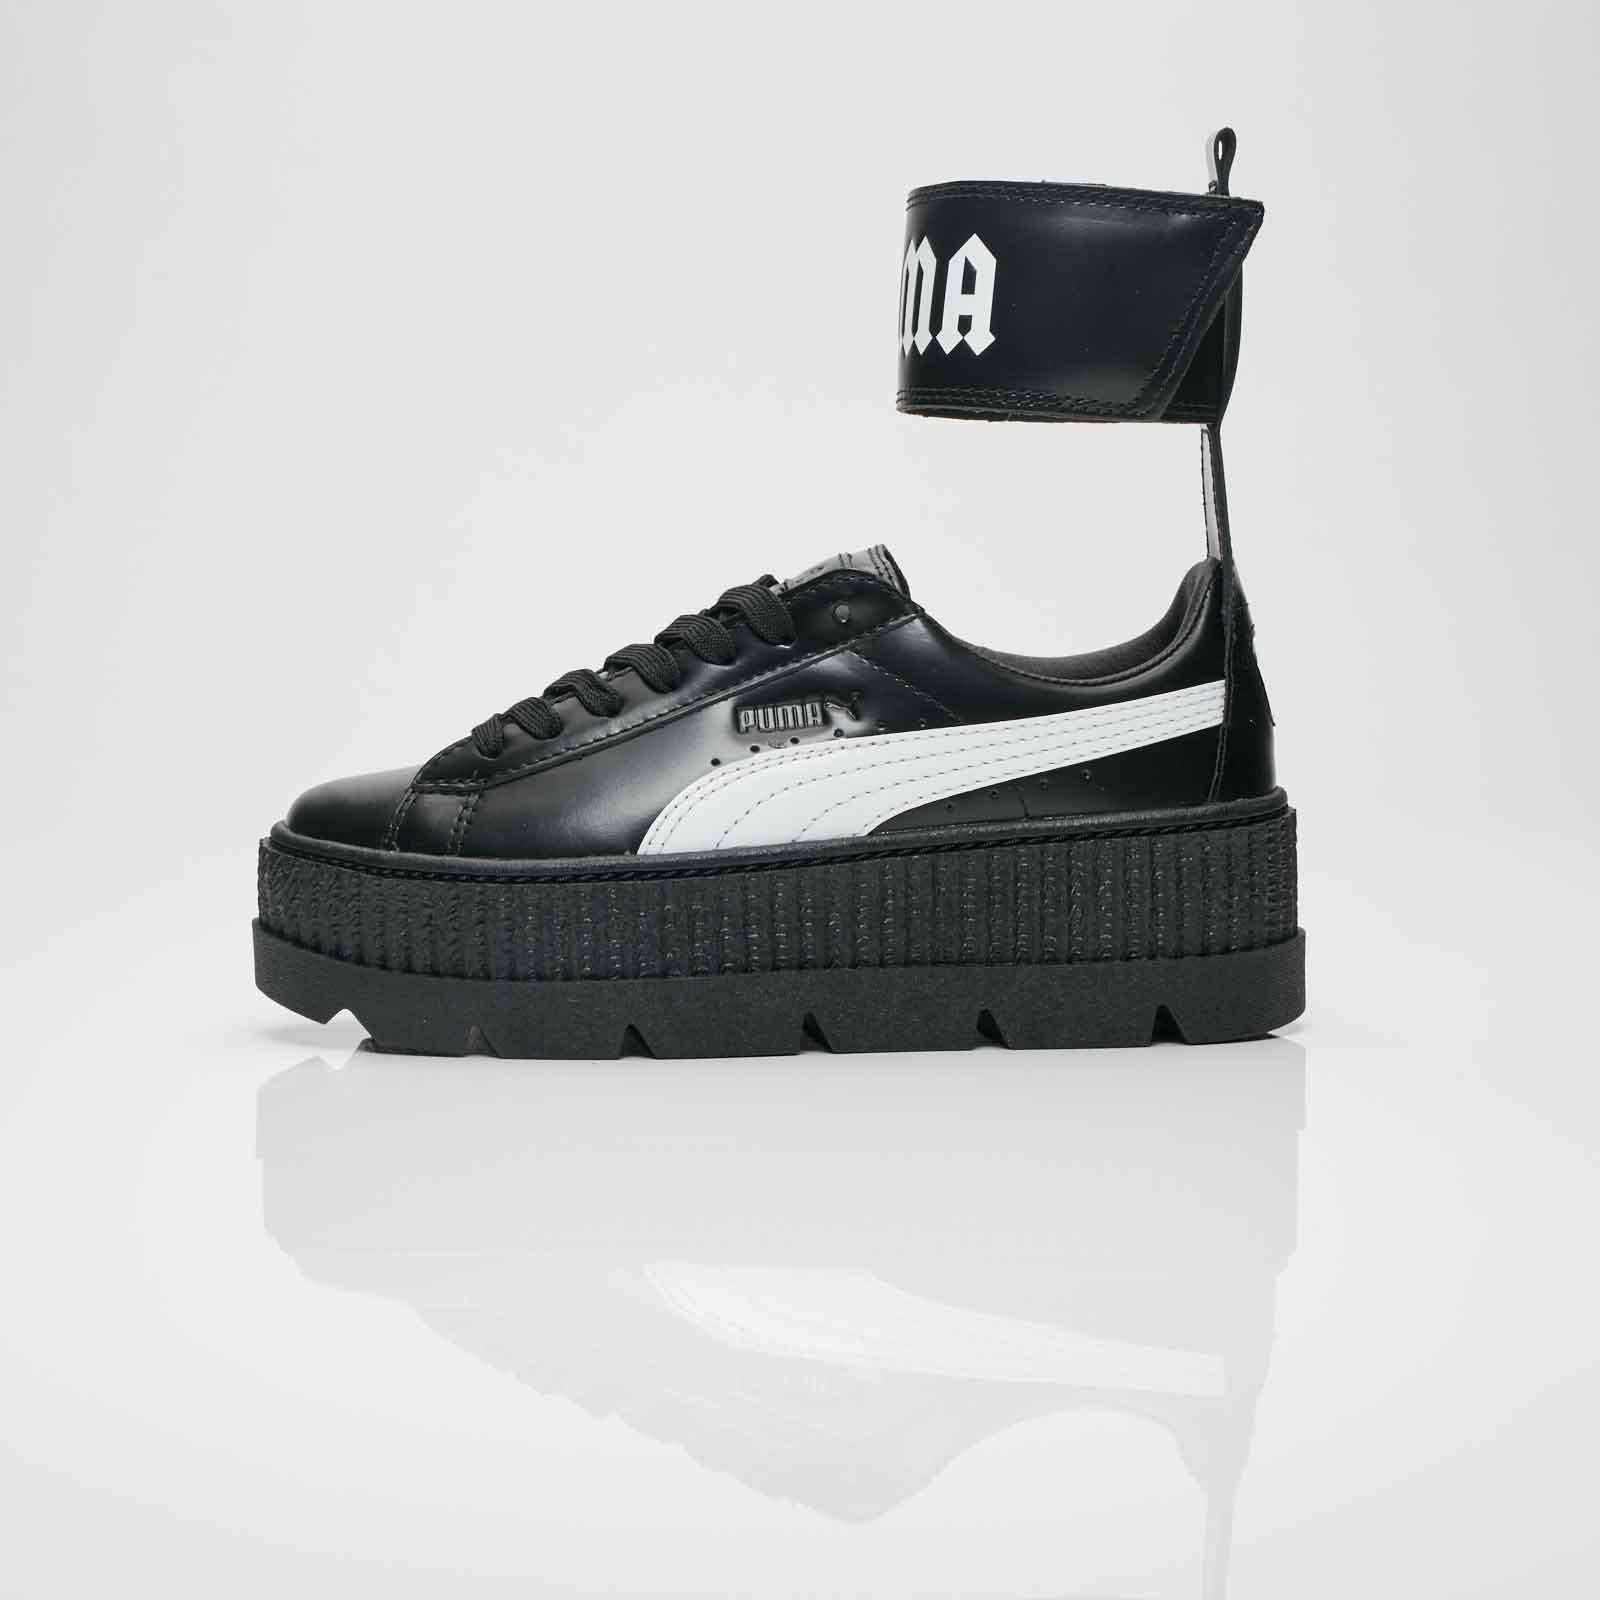 buy popular 9c917 94301 Puma Ankle Strap Sneaker Wns - 366264-03 - Sneakersnstuff ...